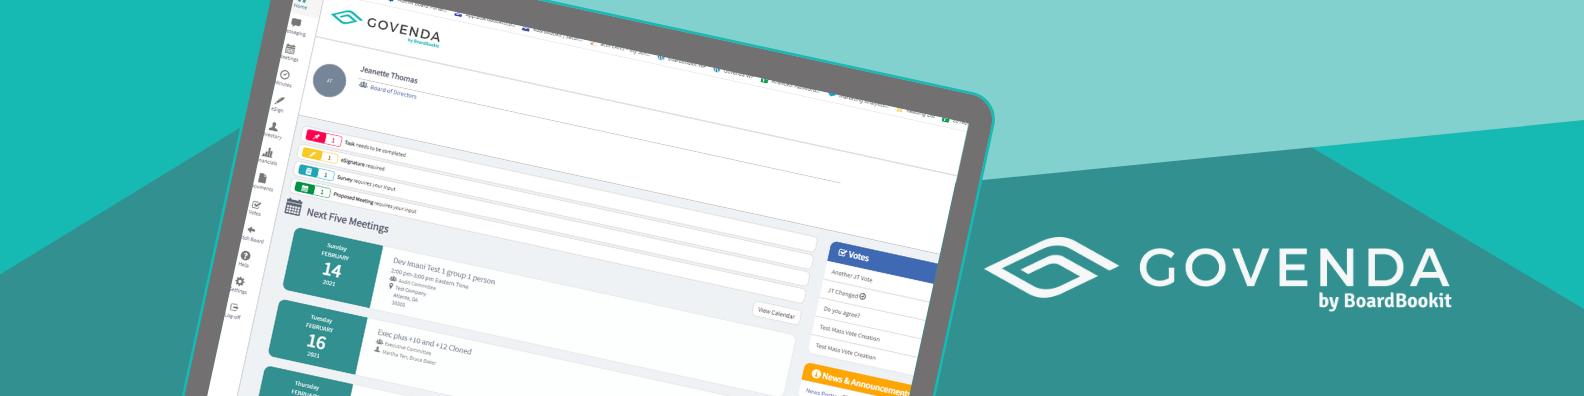 Govenda Software - The Smart Board Management Solution